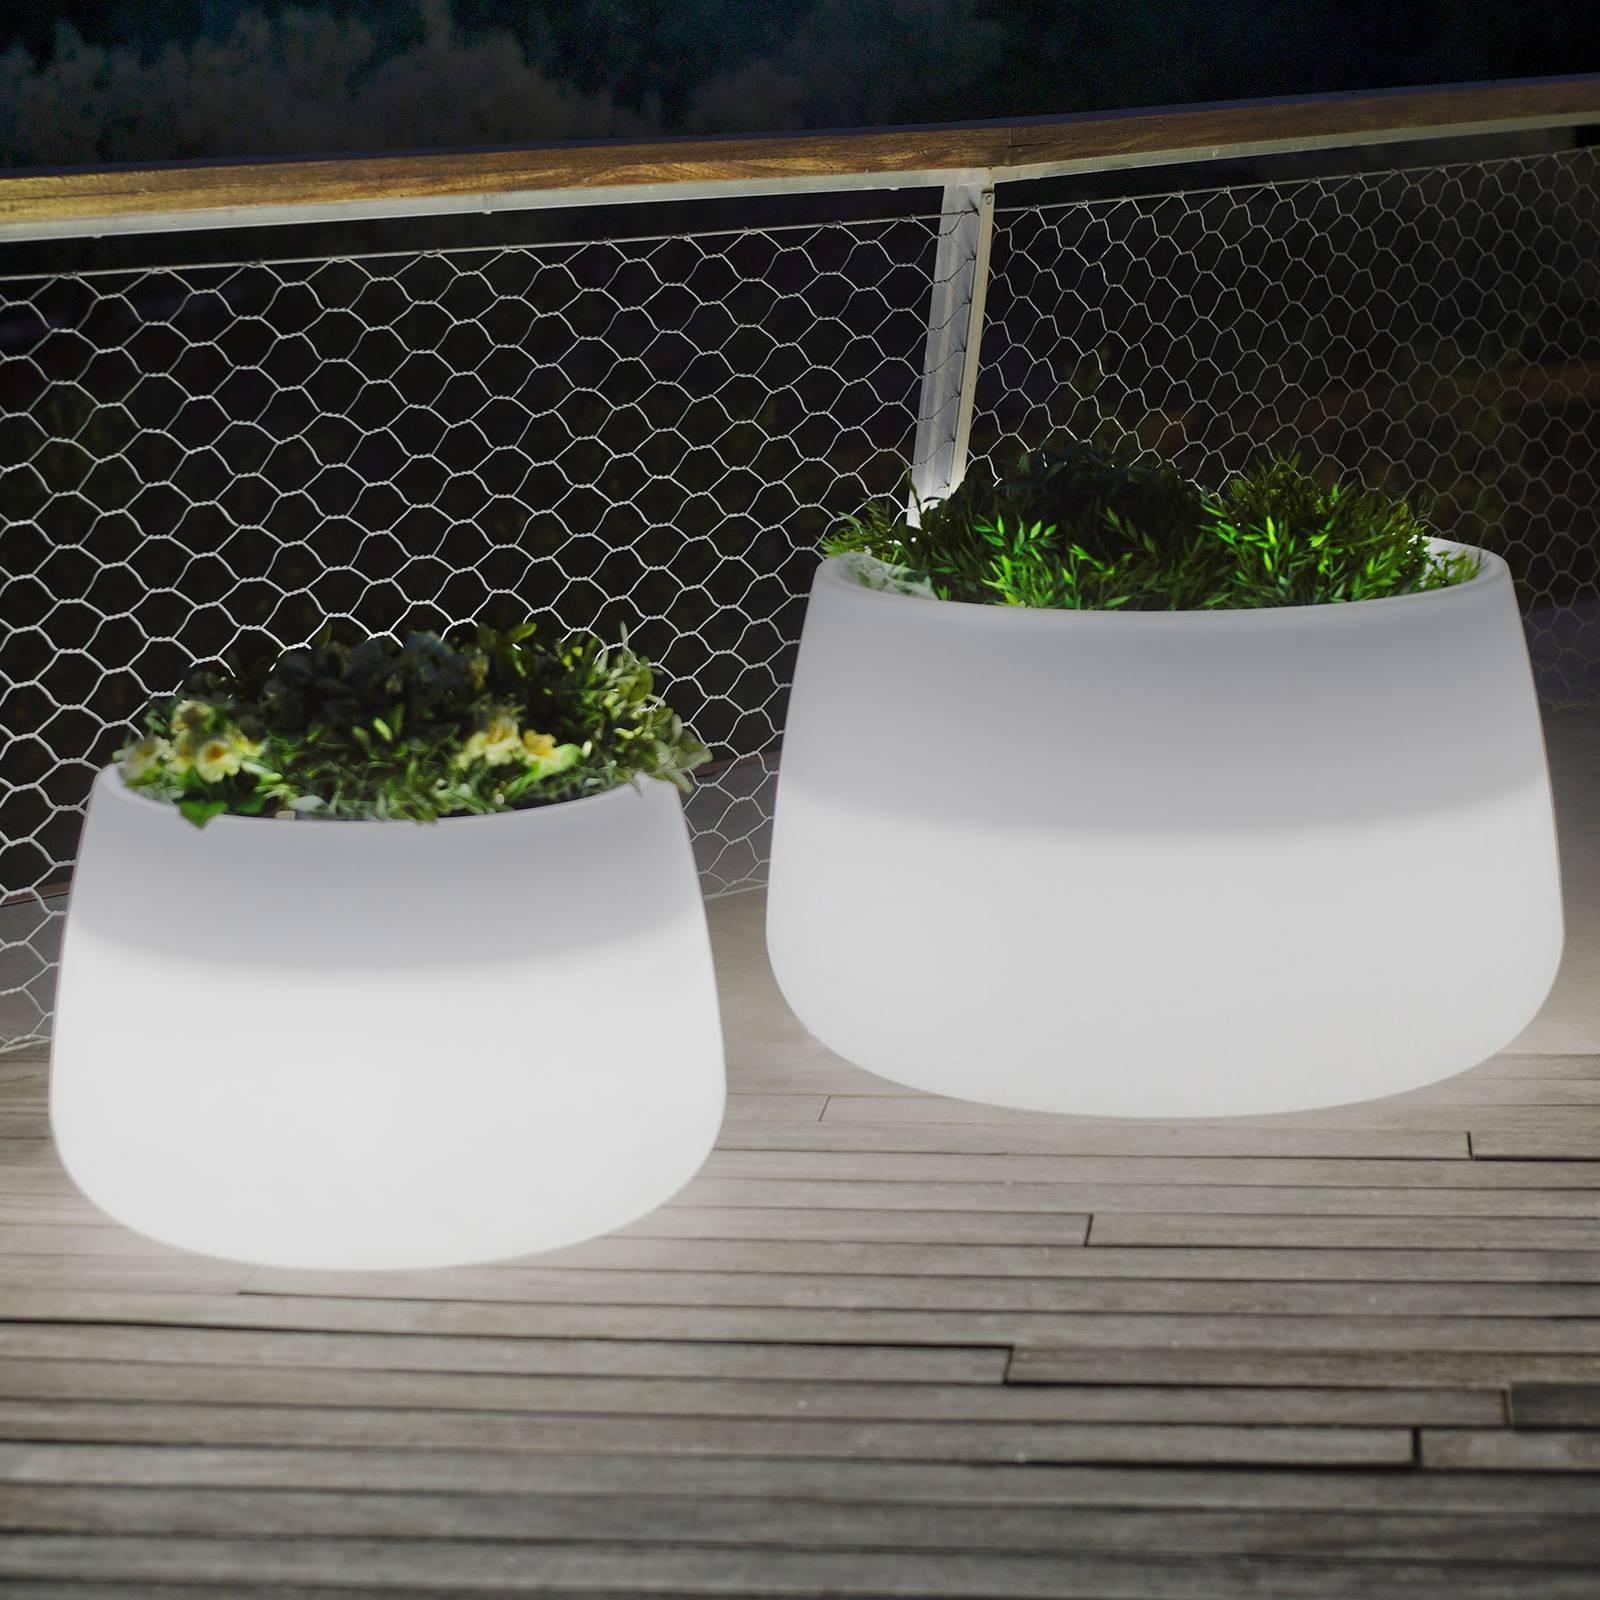 Newgarden Camelia 60 -LED-kukka-astia, akku